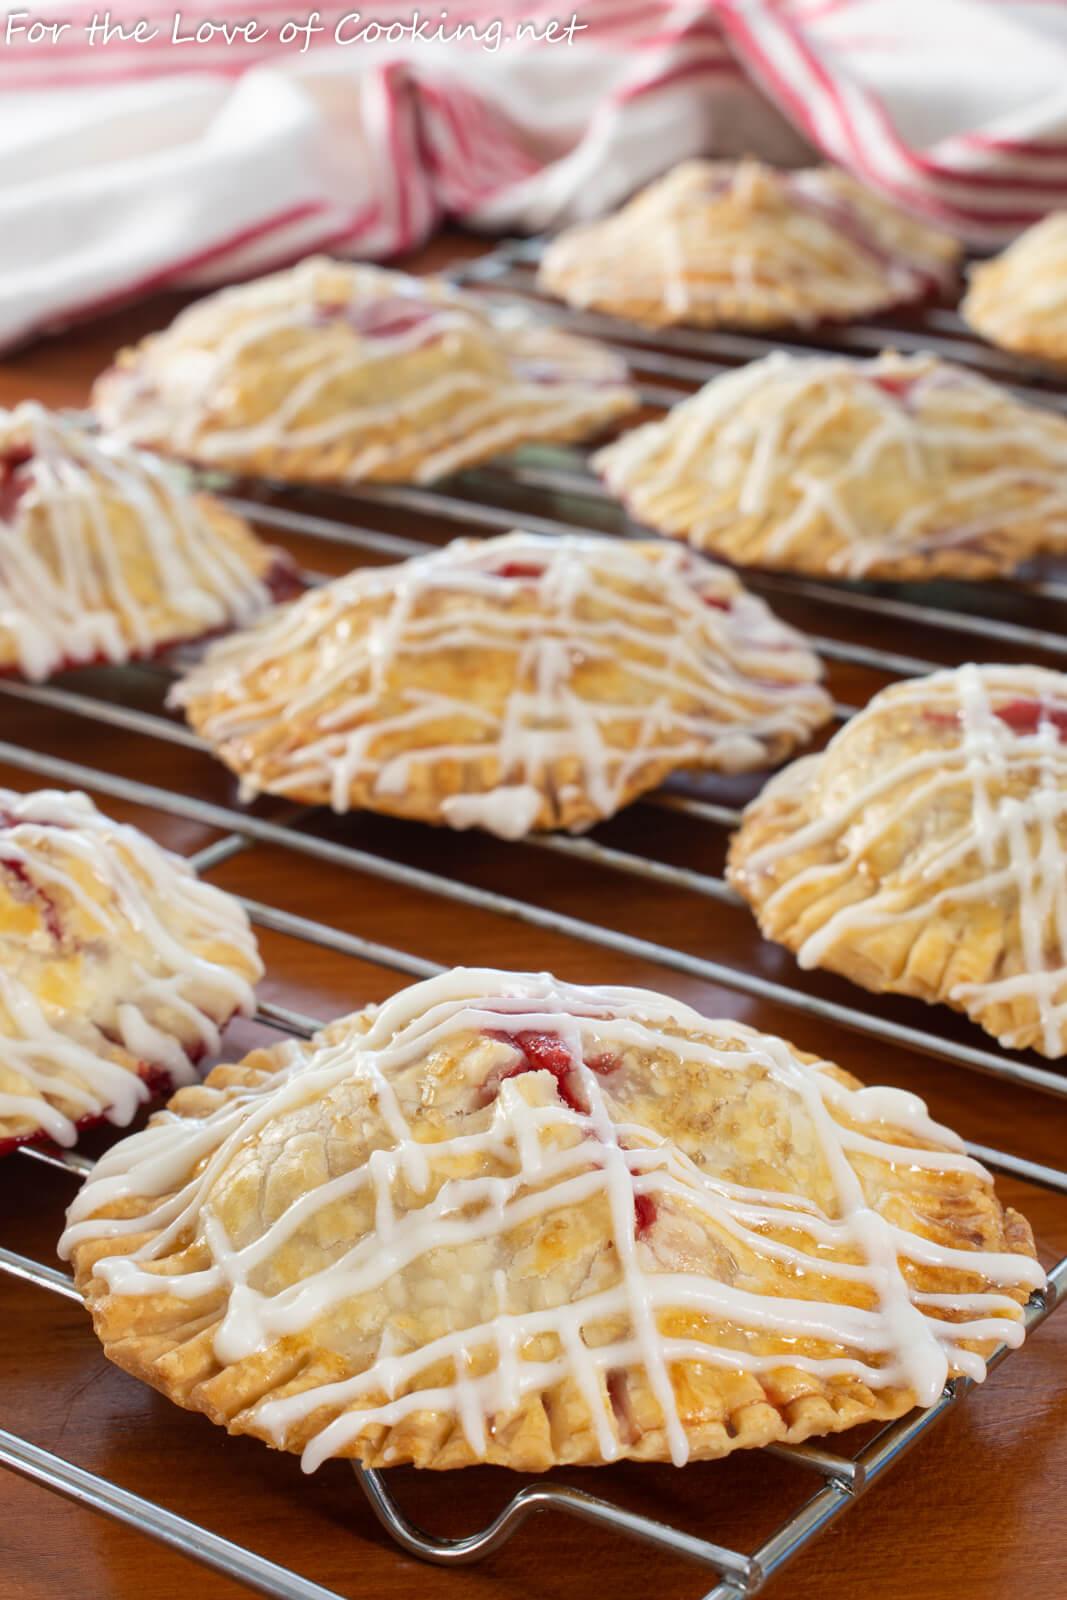 Strawberry Hand Pies with Vanilla Glaze